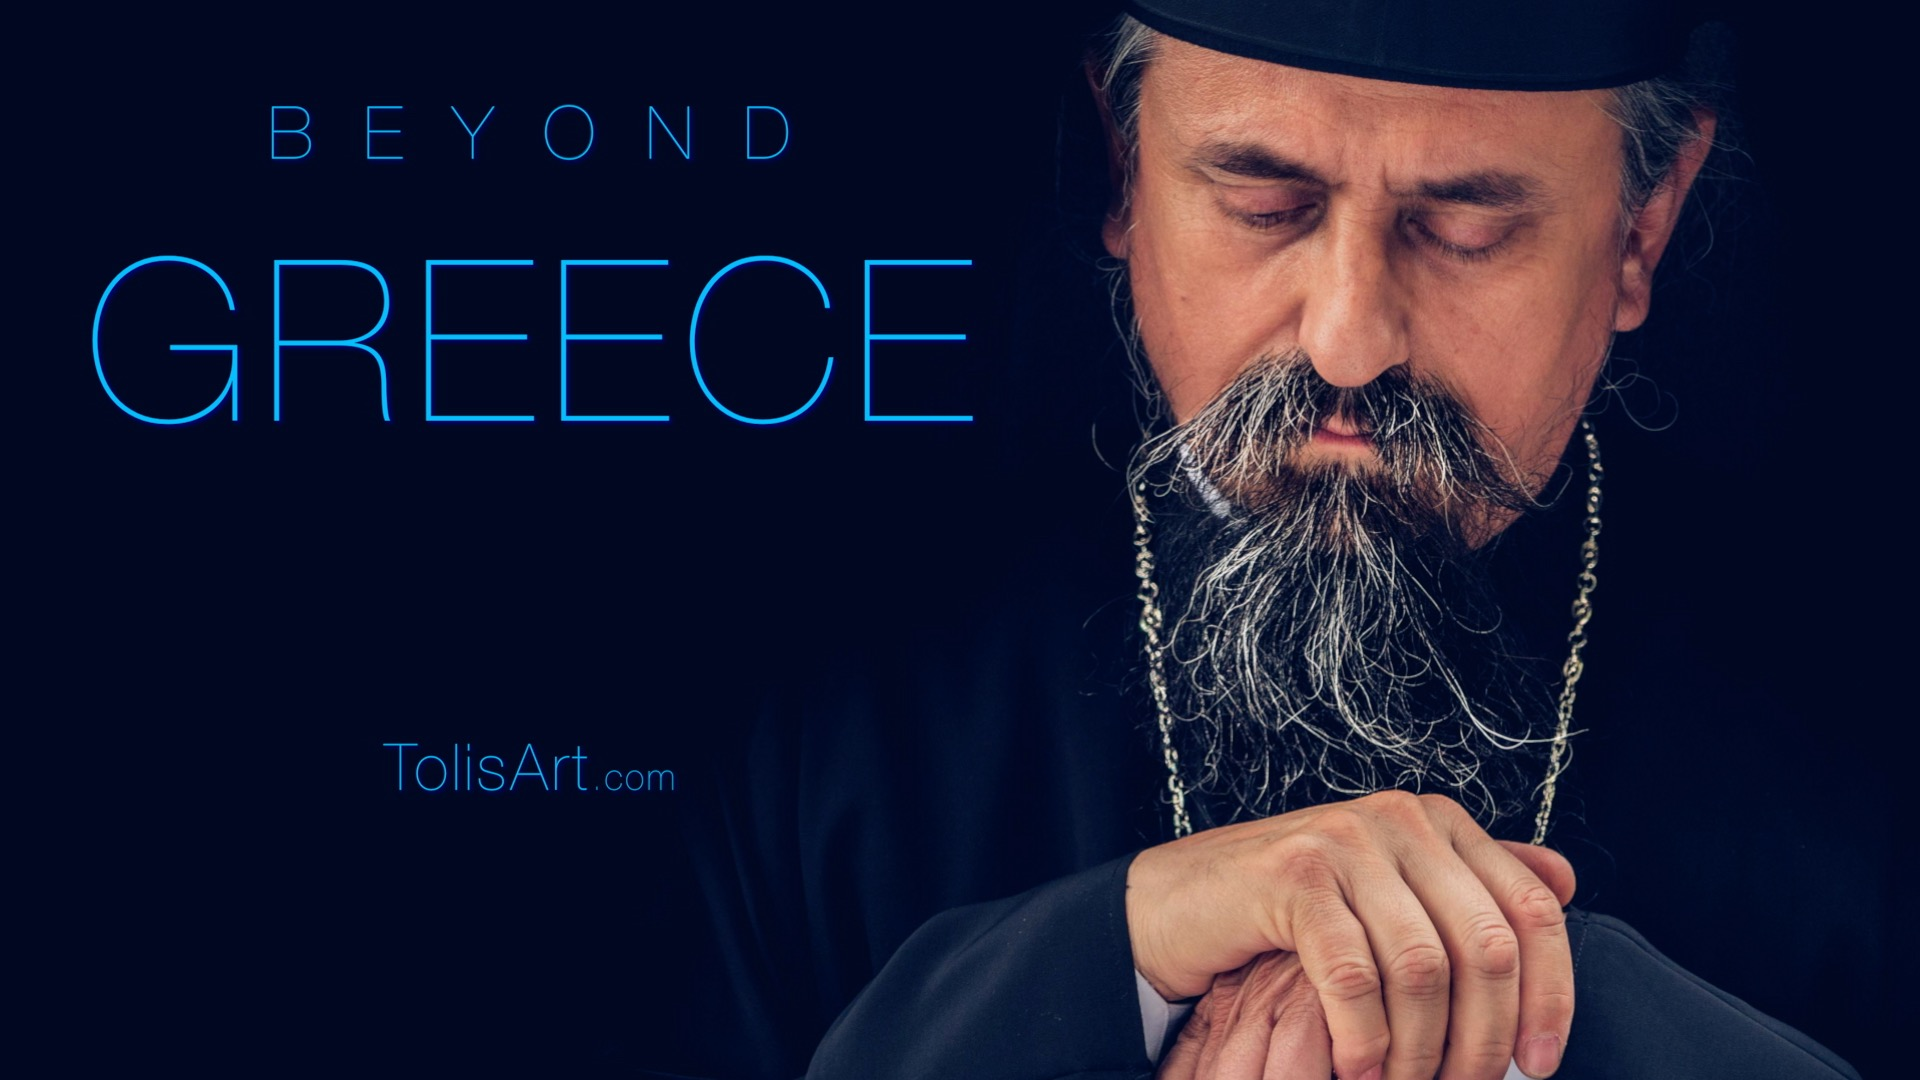 BEYOND GREECE